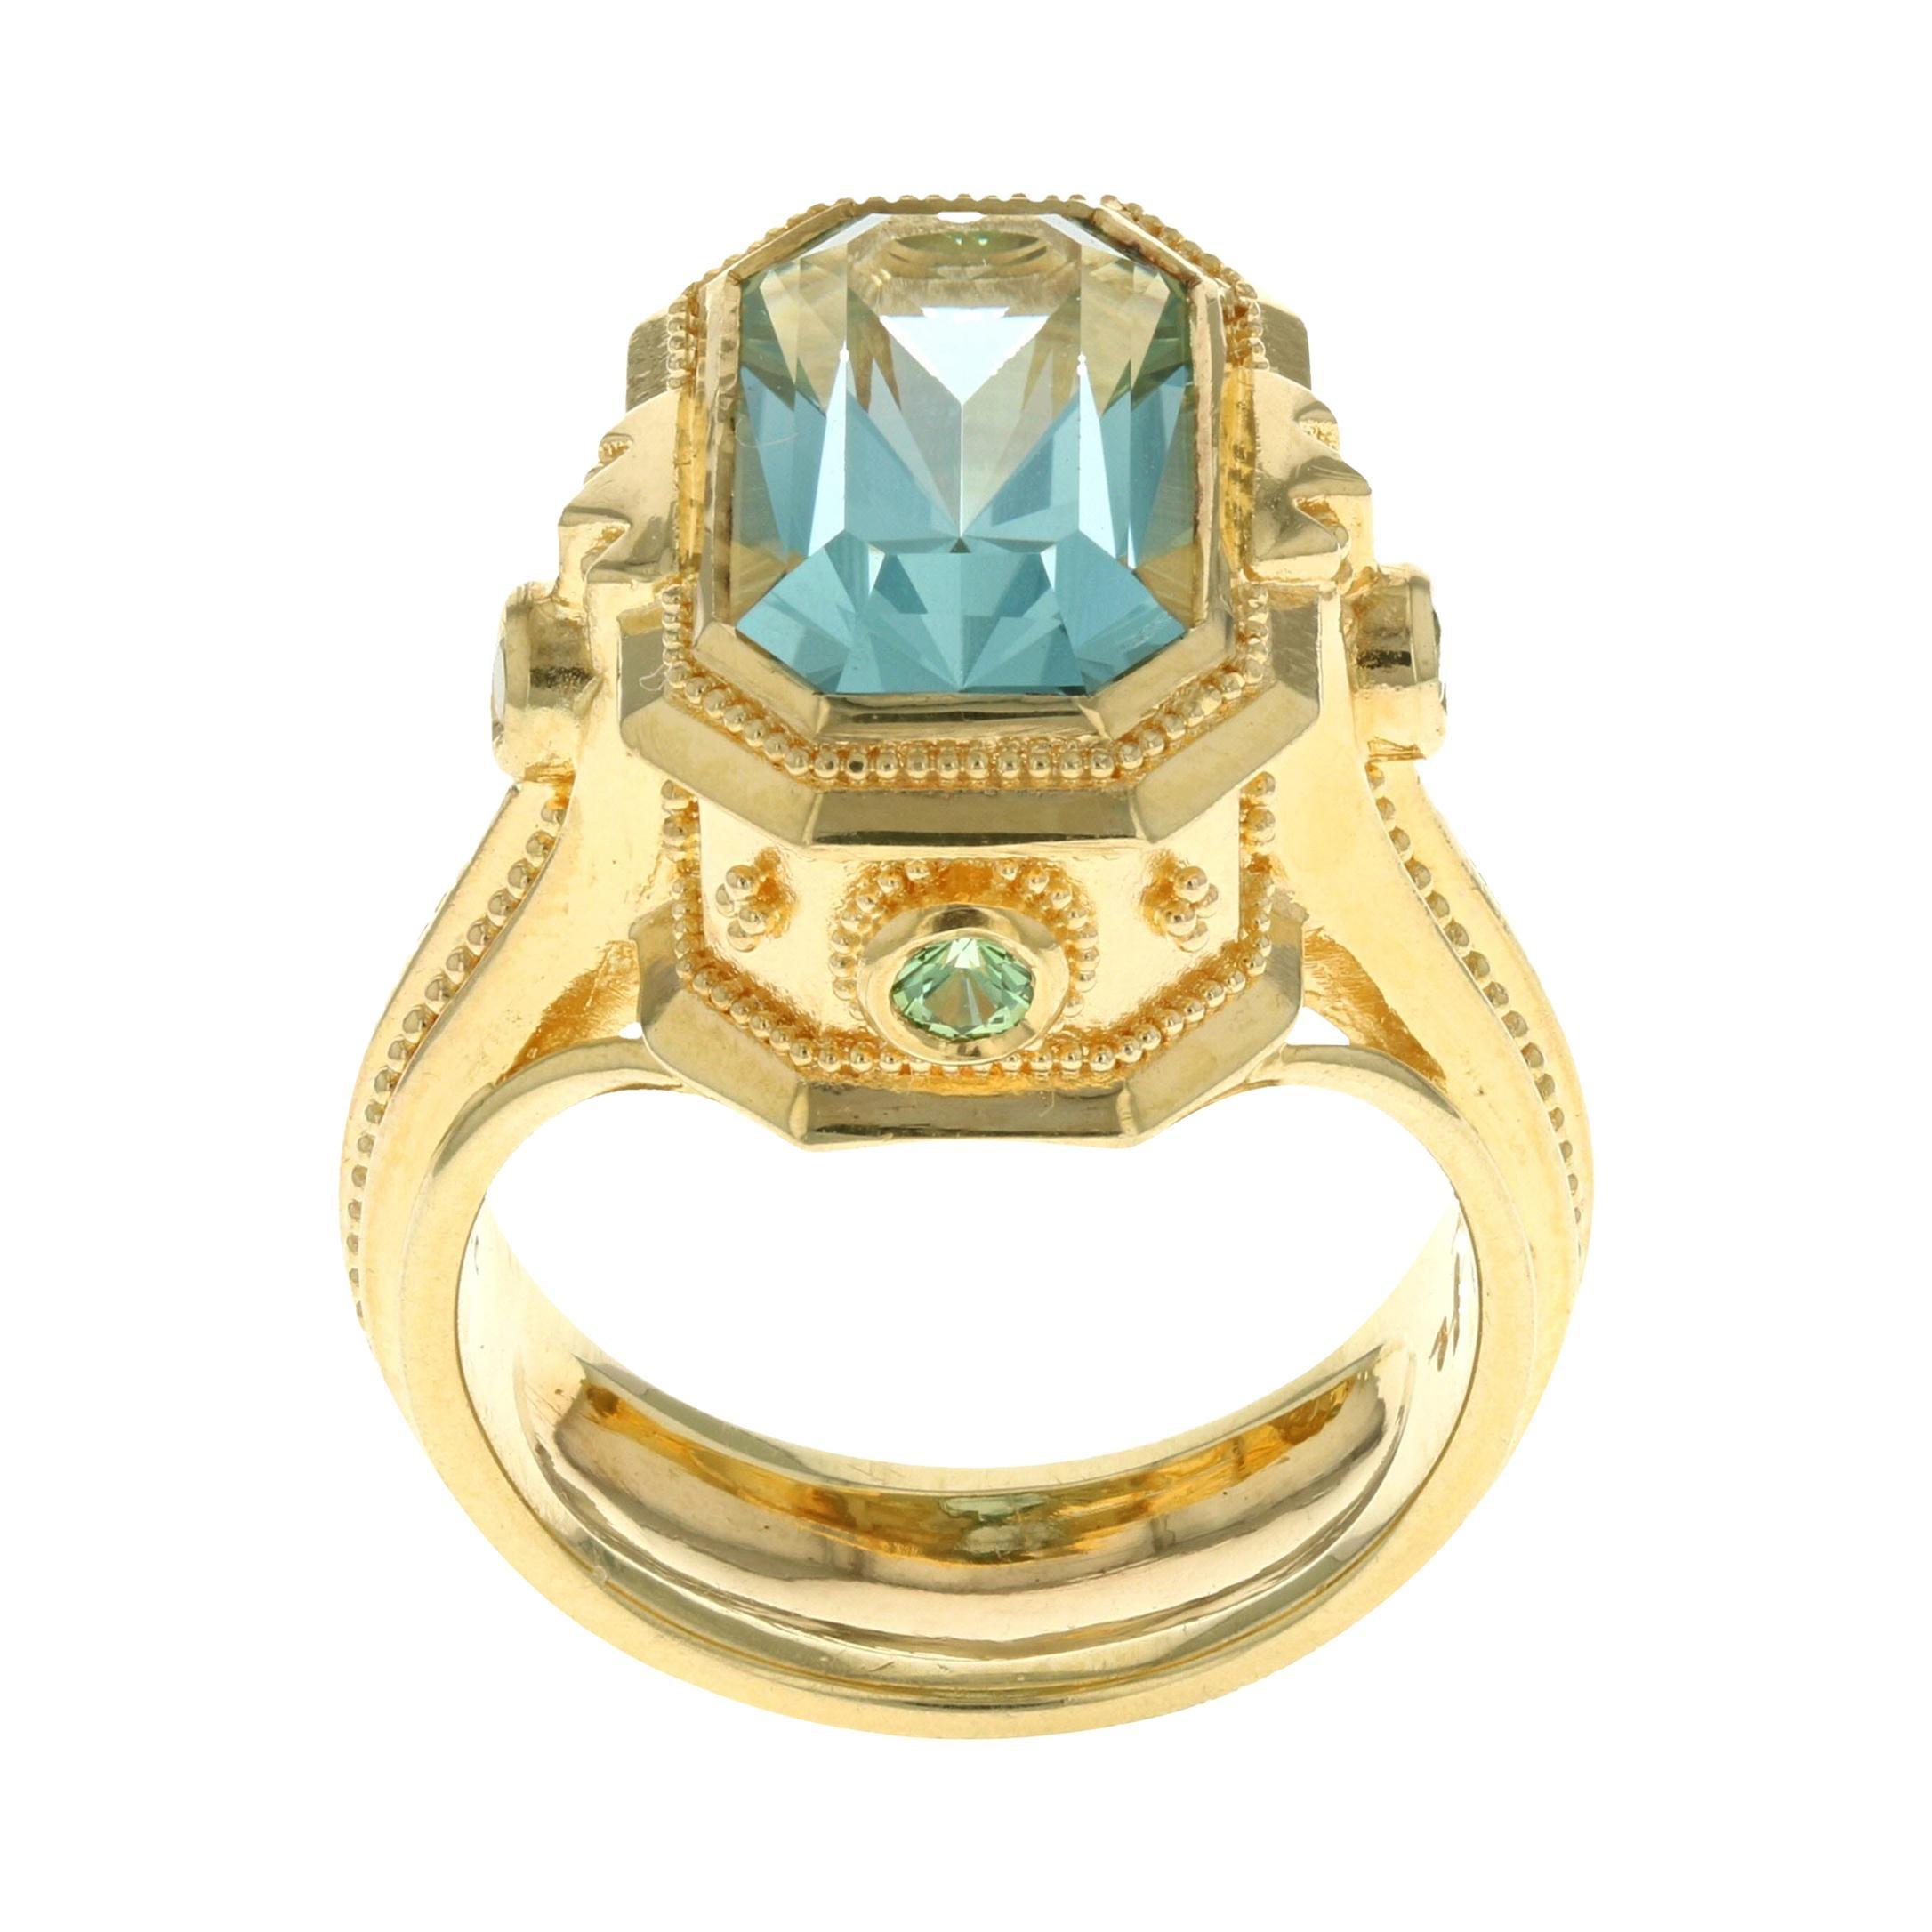 18 Karat Gold Granulation Kent Raible Aquamarine Cocktail Ring with Green Garnet